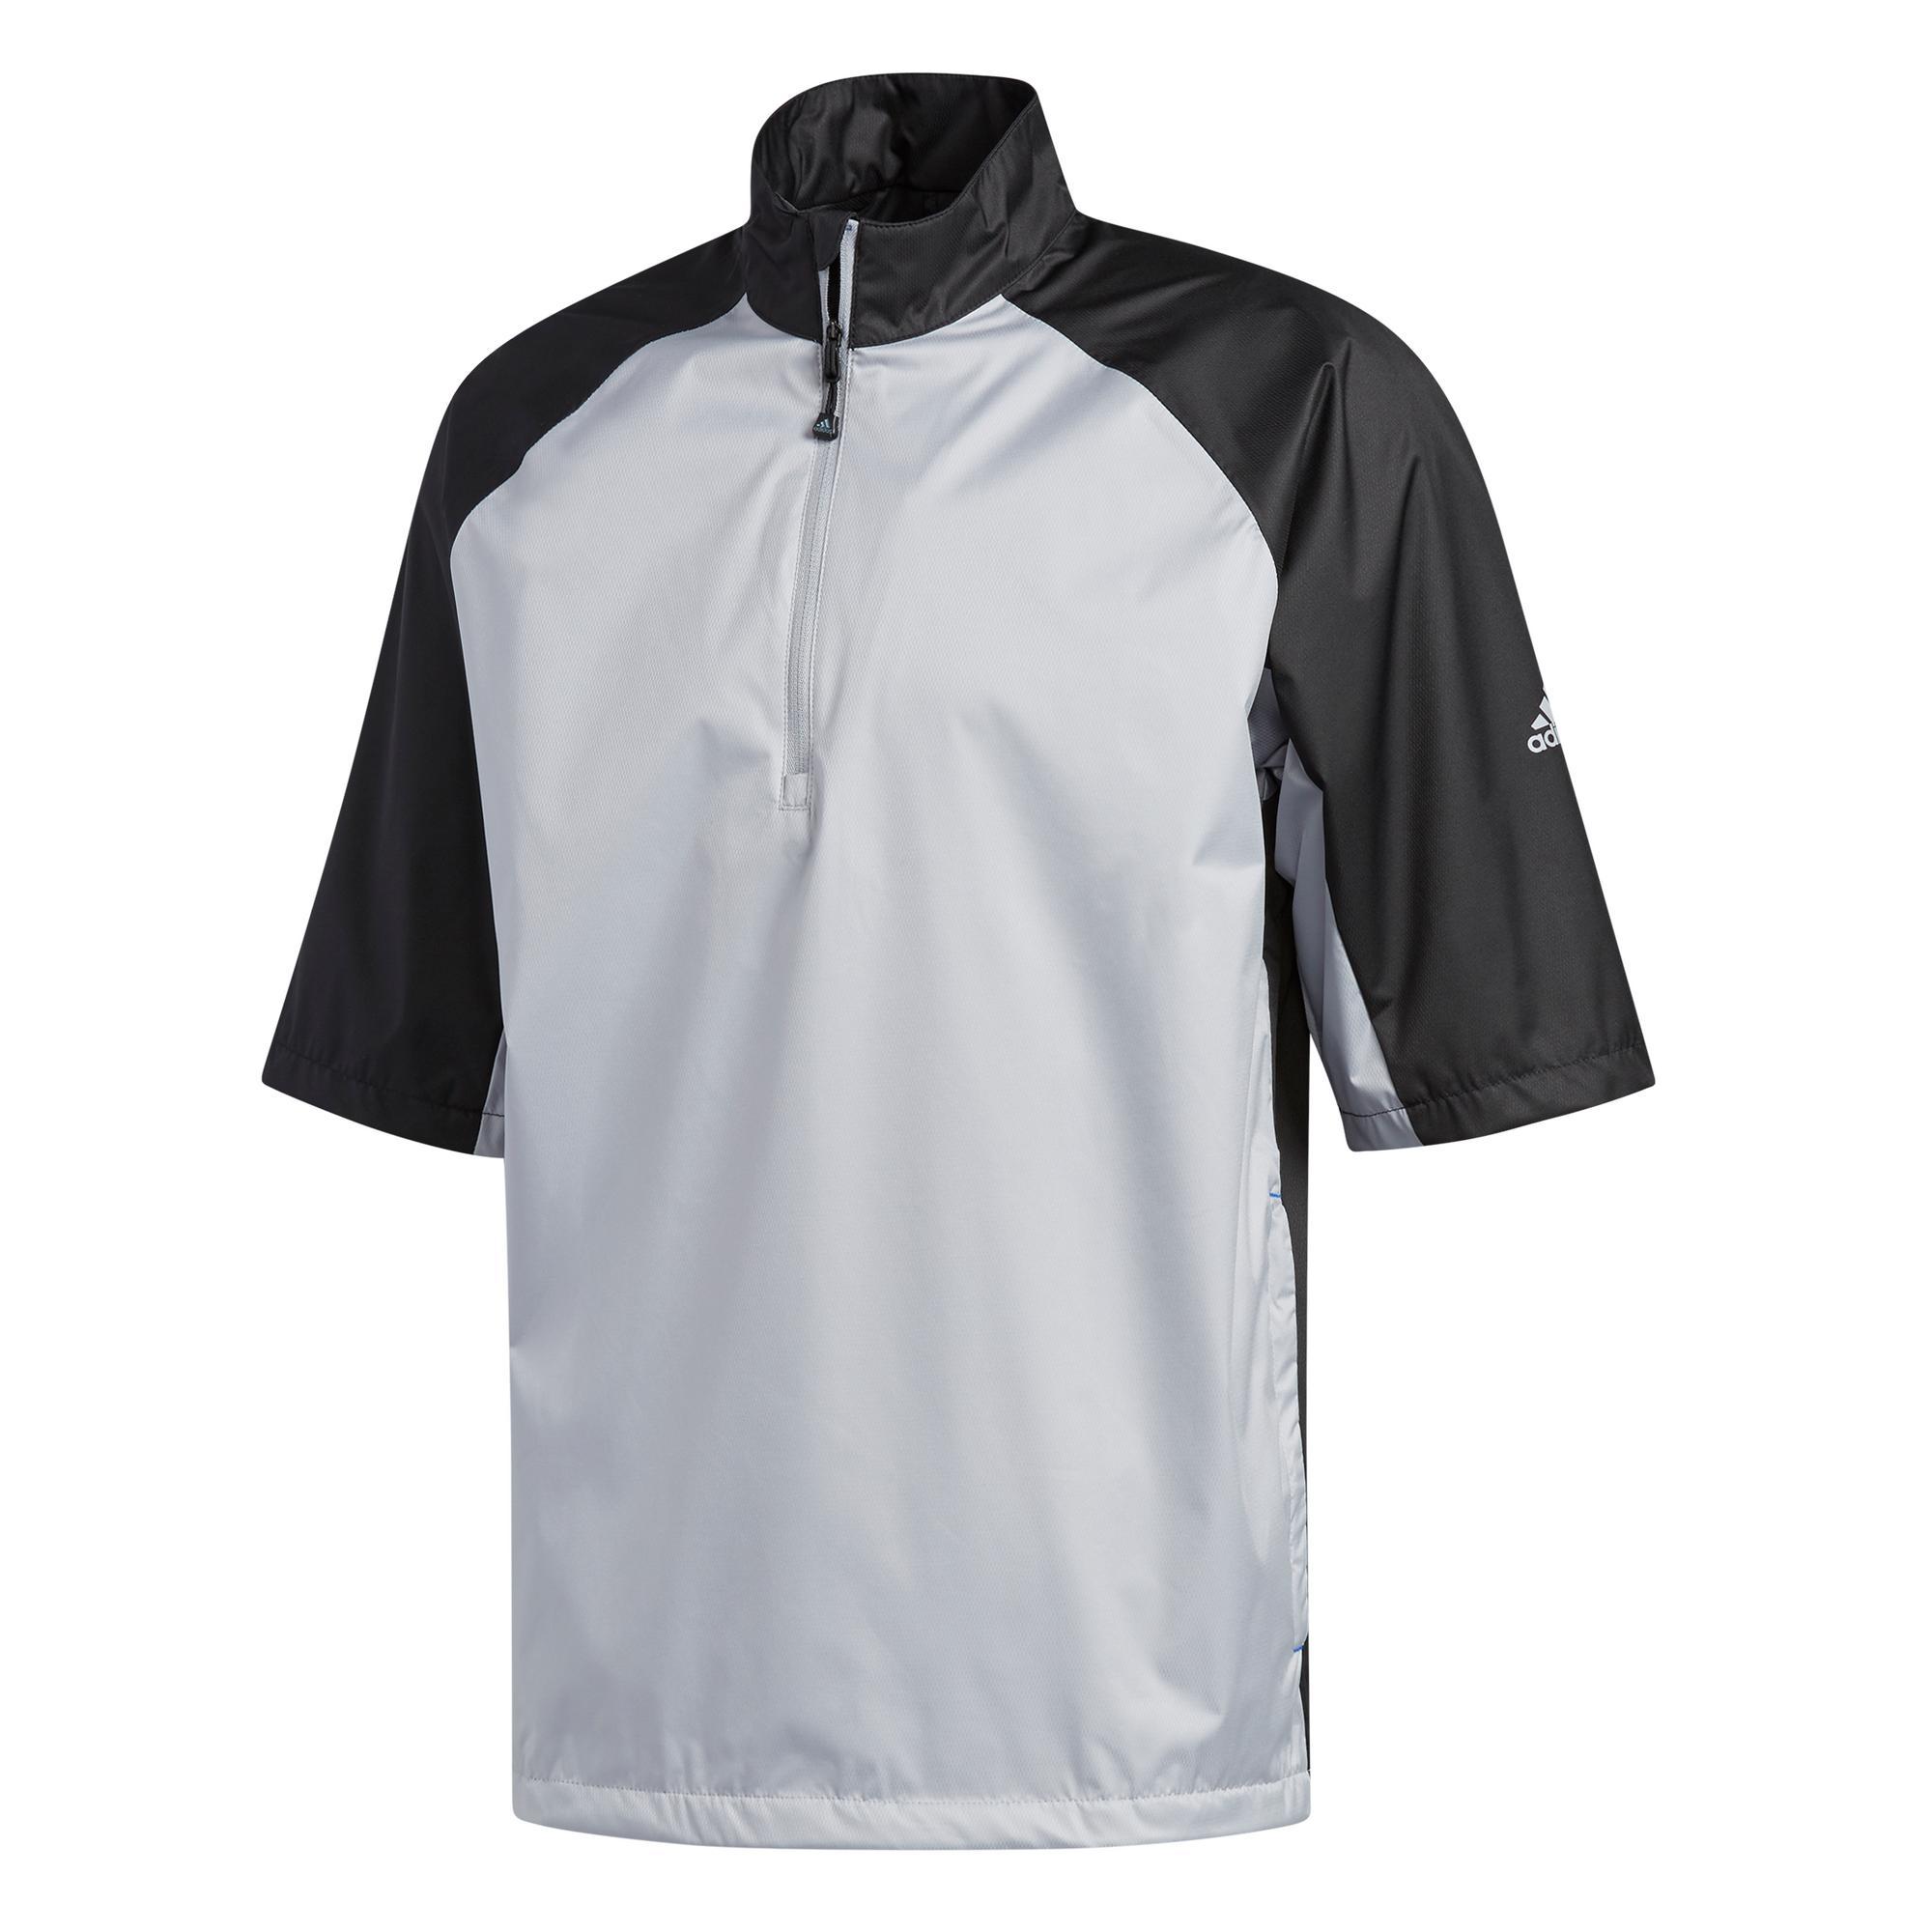 ADIDAS Men's Climastorm Provisional Short Sleeve Rain Jacket